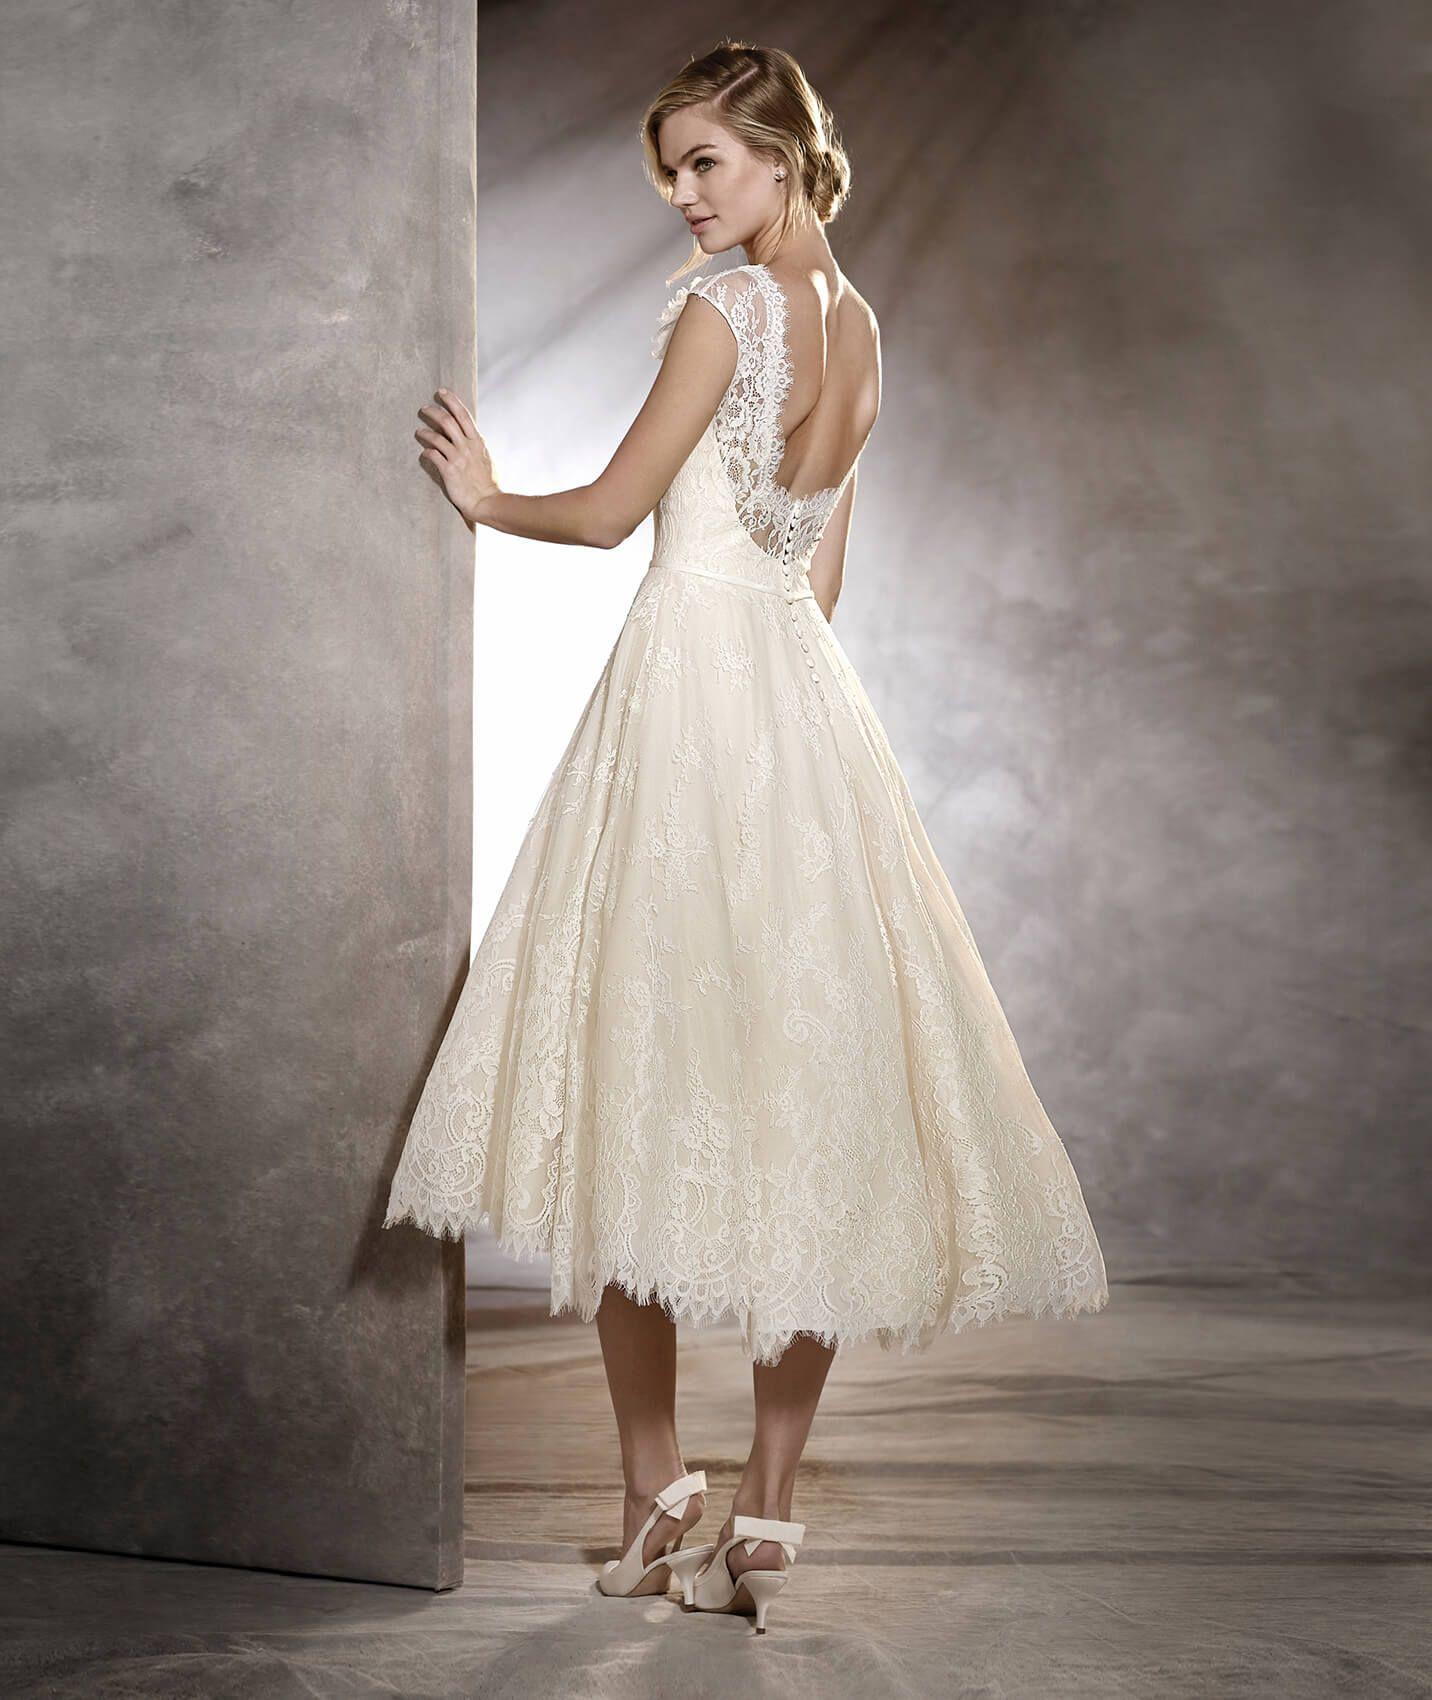 OLGA - Kurzes Brautkleid im Vintage-Stil aus Spitze | Brautkleid ...